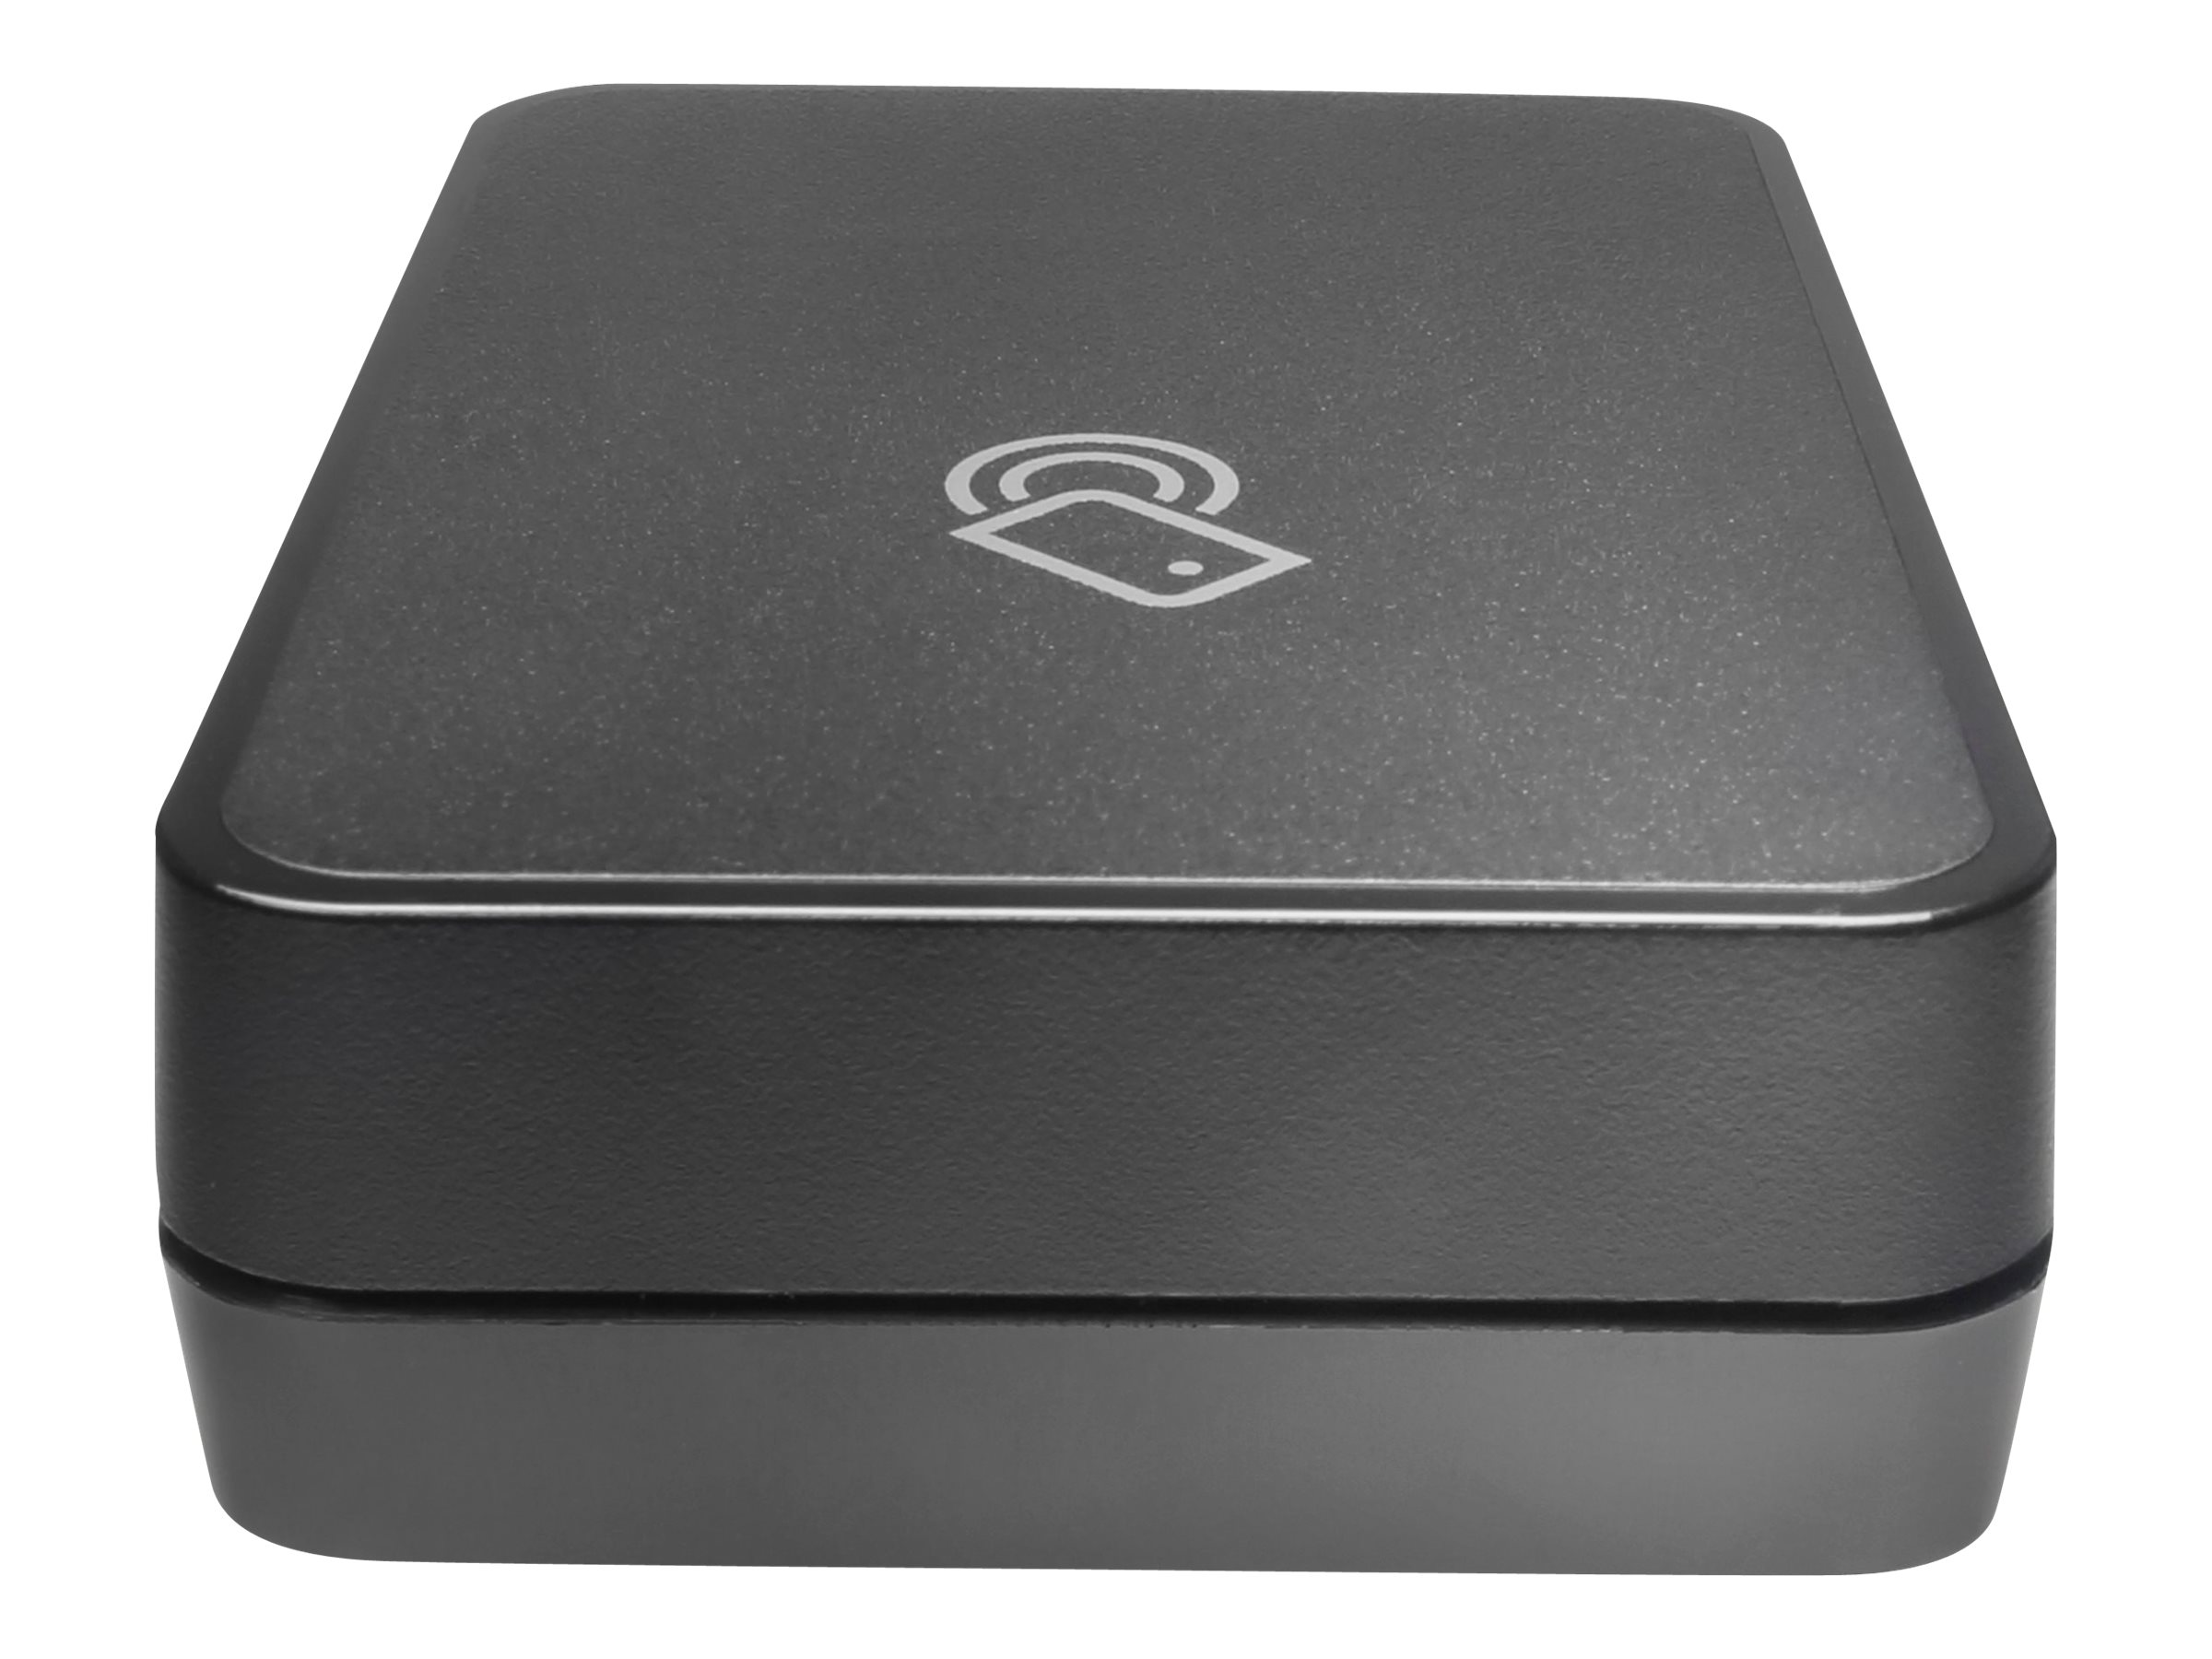 HP JetDirect 3100w - print server